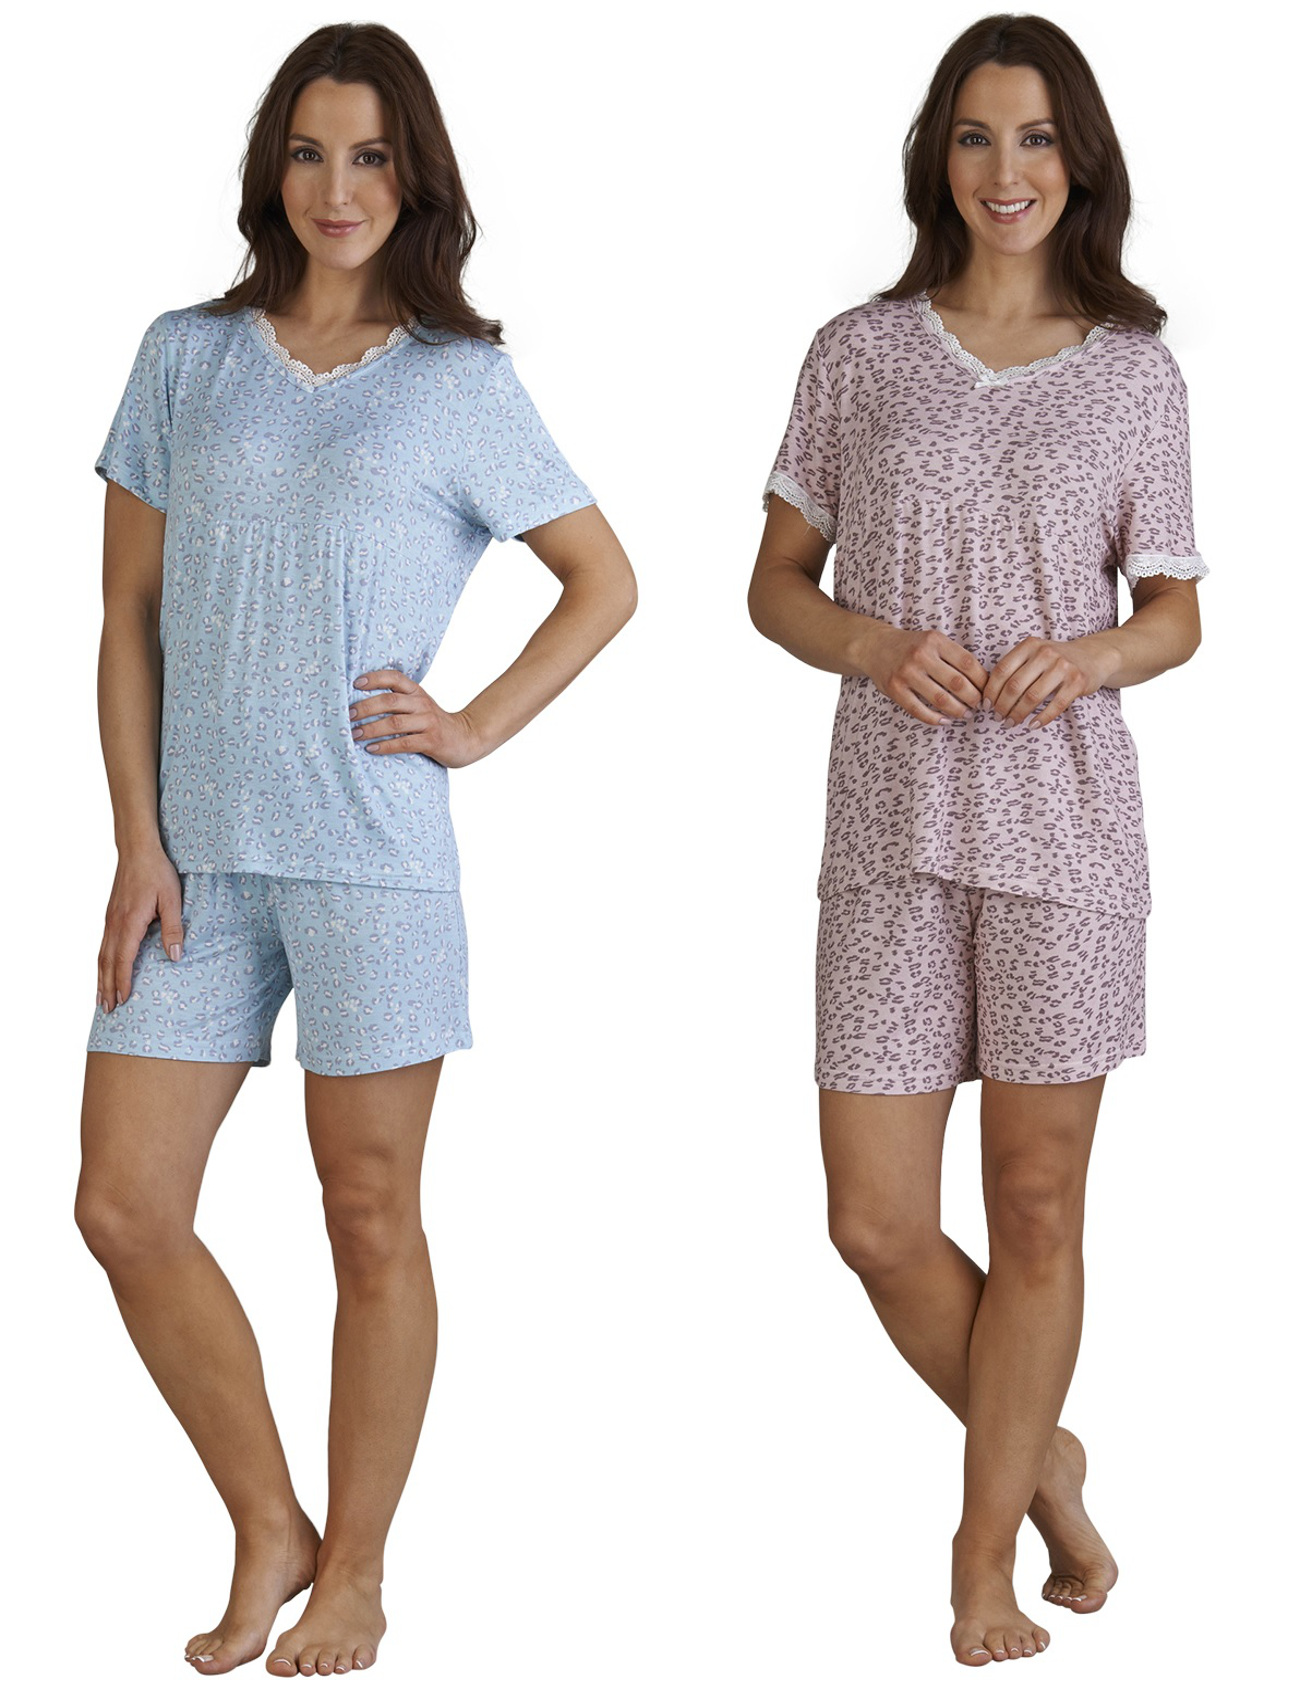 Slenderella Leopard Print Pyjamas Ladies T Shirt Shorts PJs Set Womens  Nightwear a2878c34a